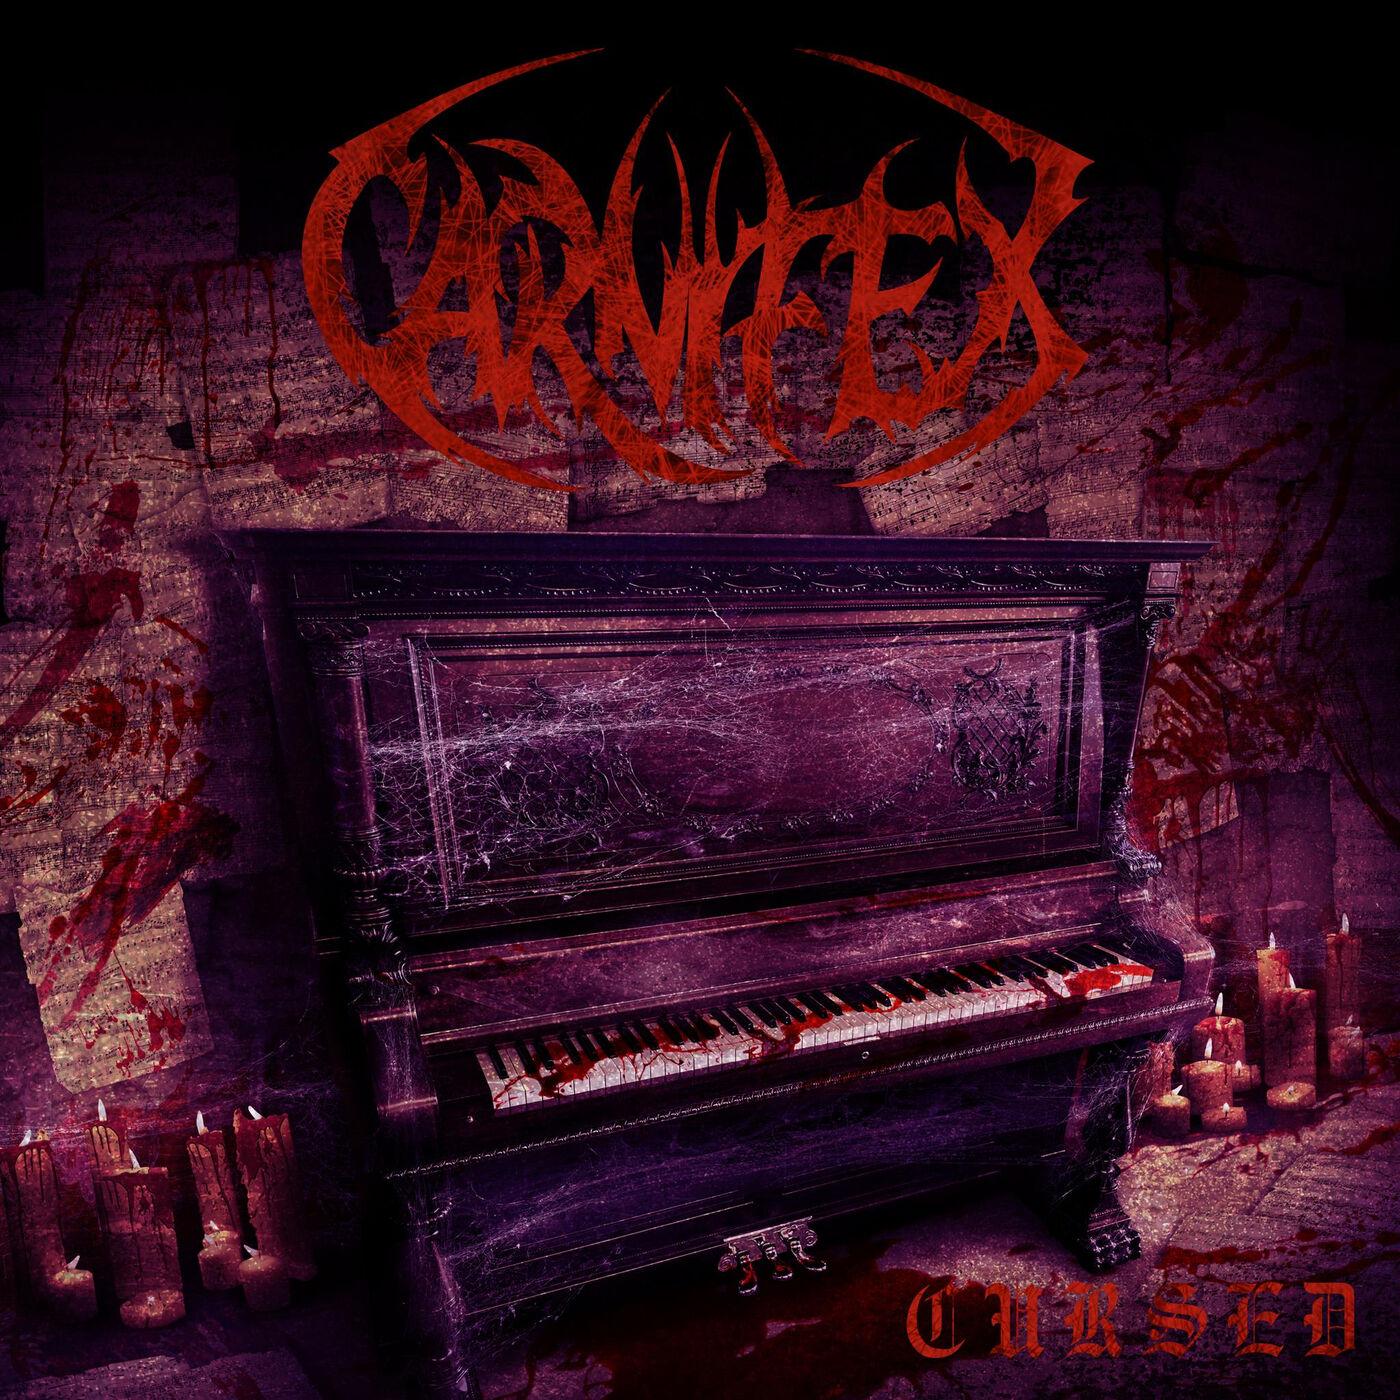 Carnifex - Cursed [single] (2020)